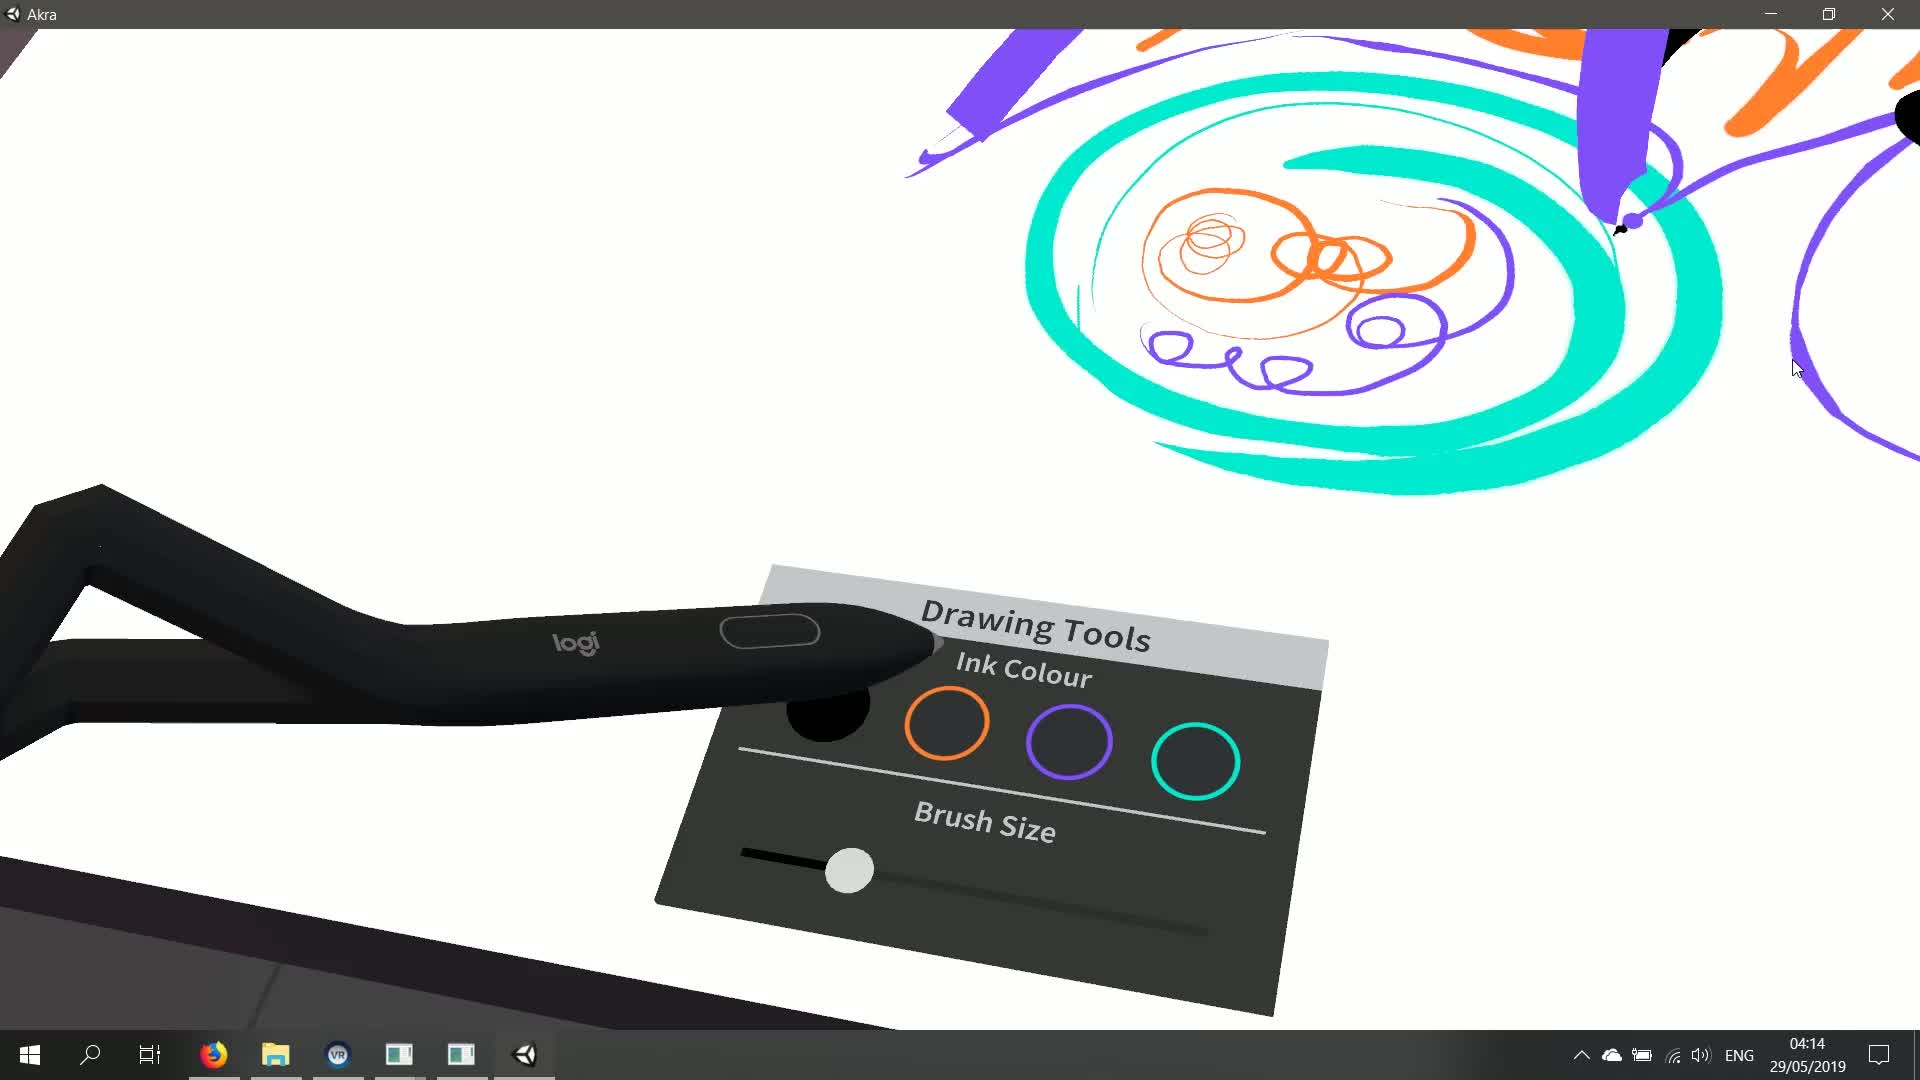 Logitech VR Ink – Testing Handwriting GIFs